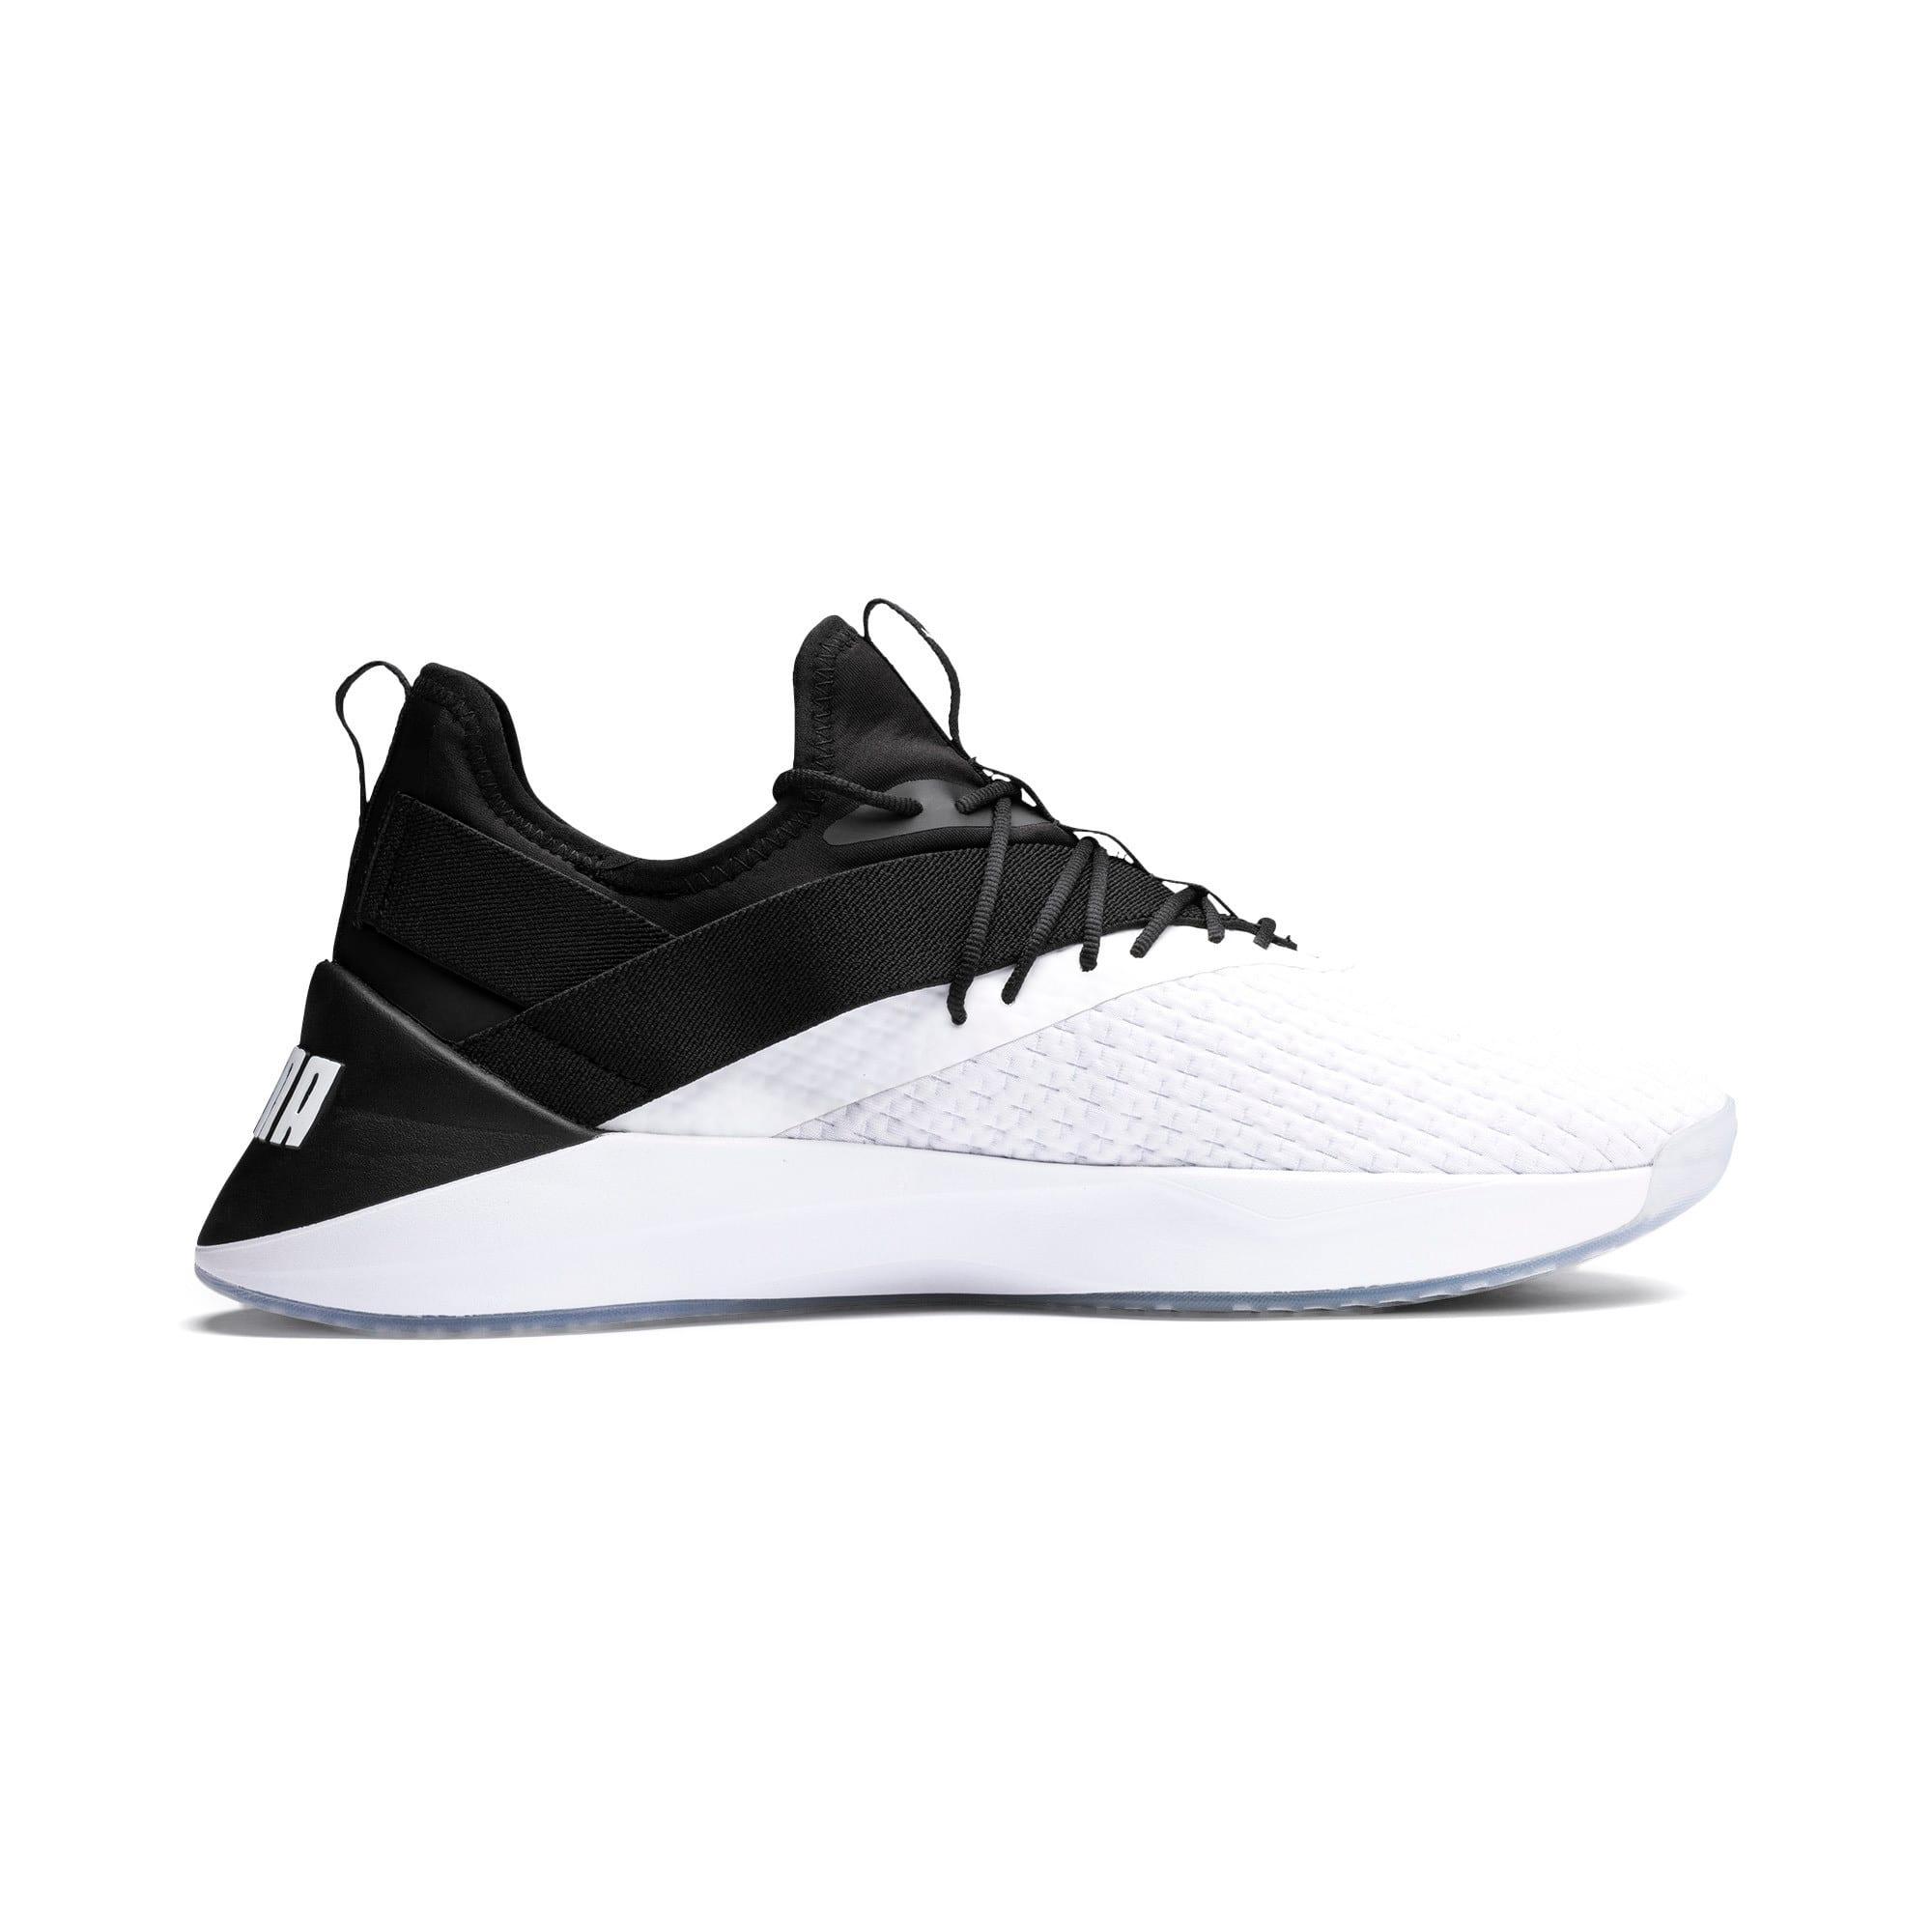 Thumbnail 7 of Jaab XT Herren Sneaker, Puma White-Puma Black, medium